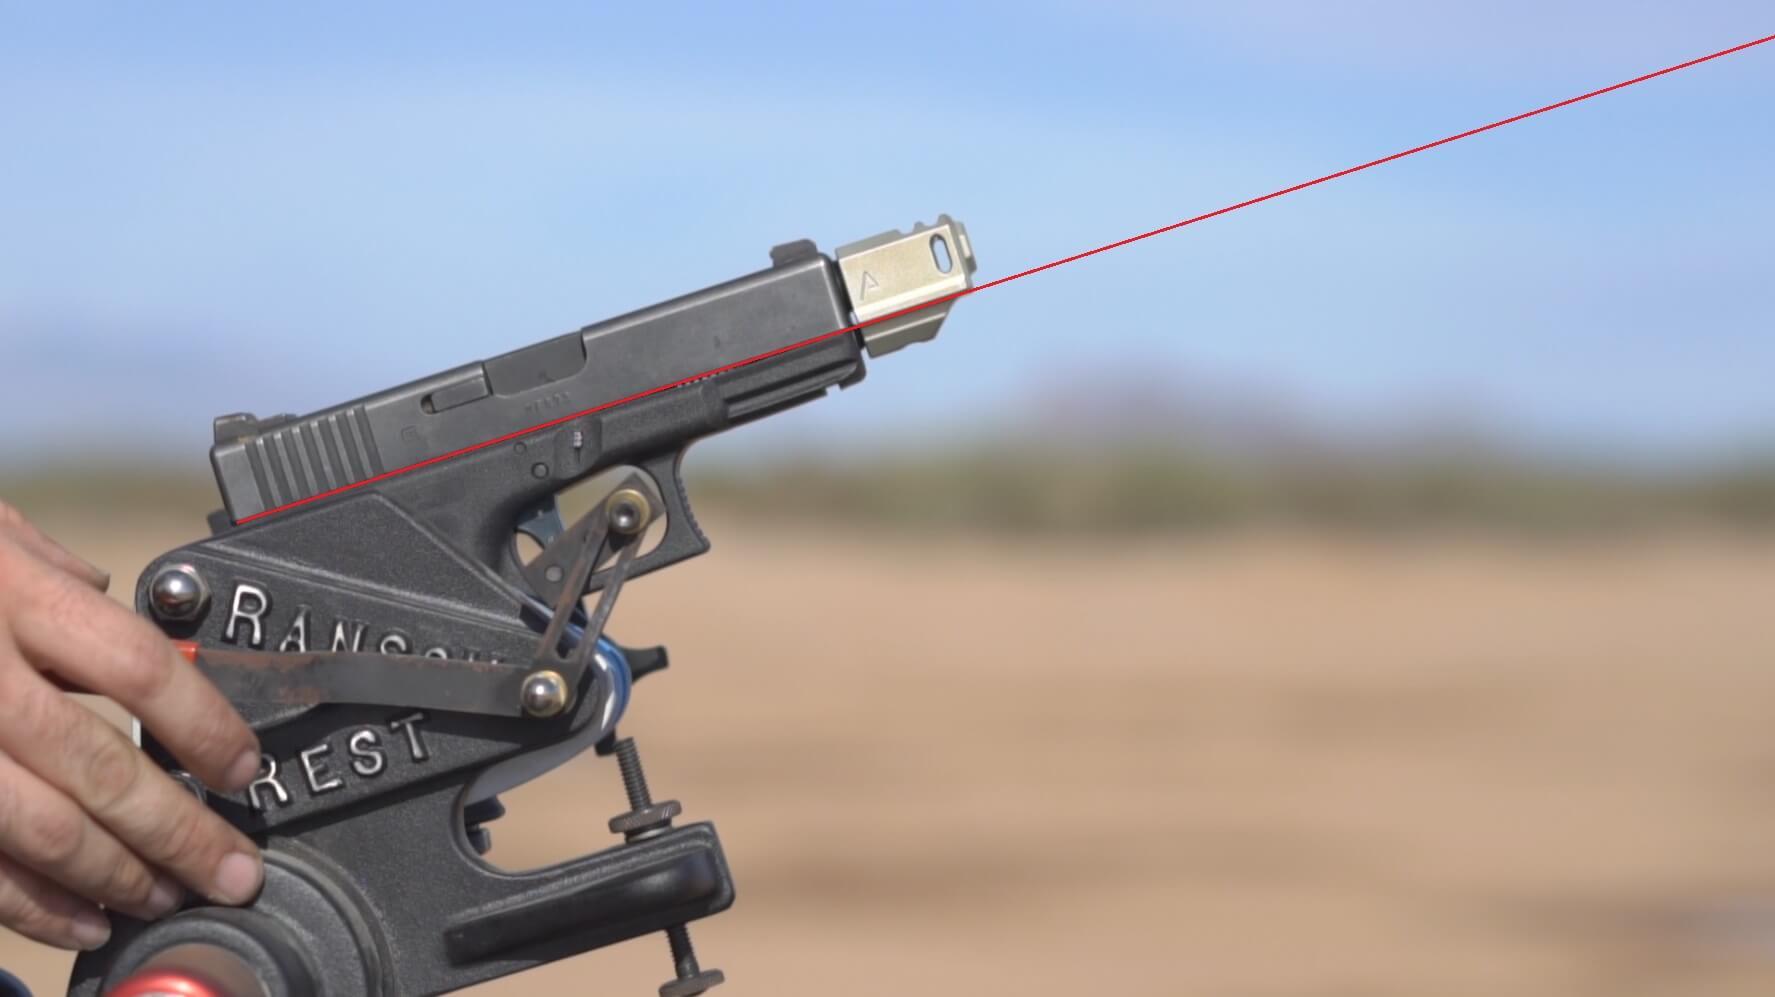 2018 King of Pistol Comps – Glock Compensator Slickguns